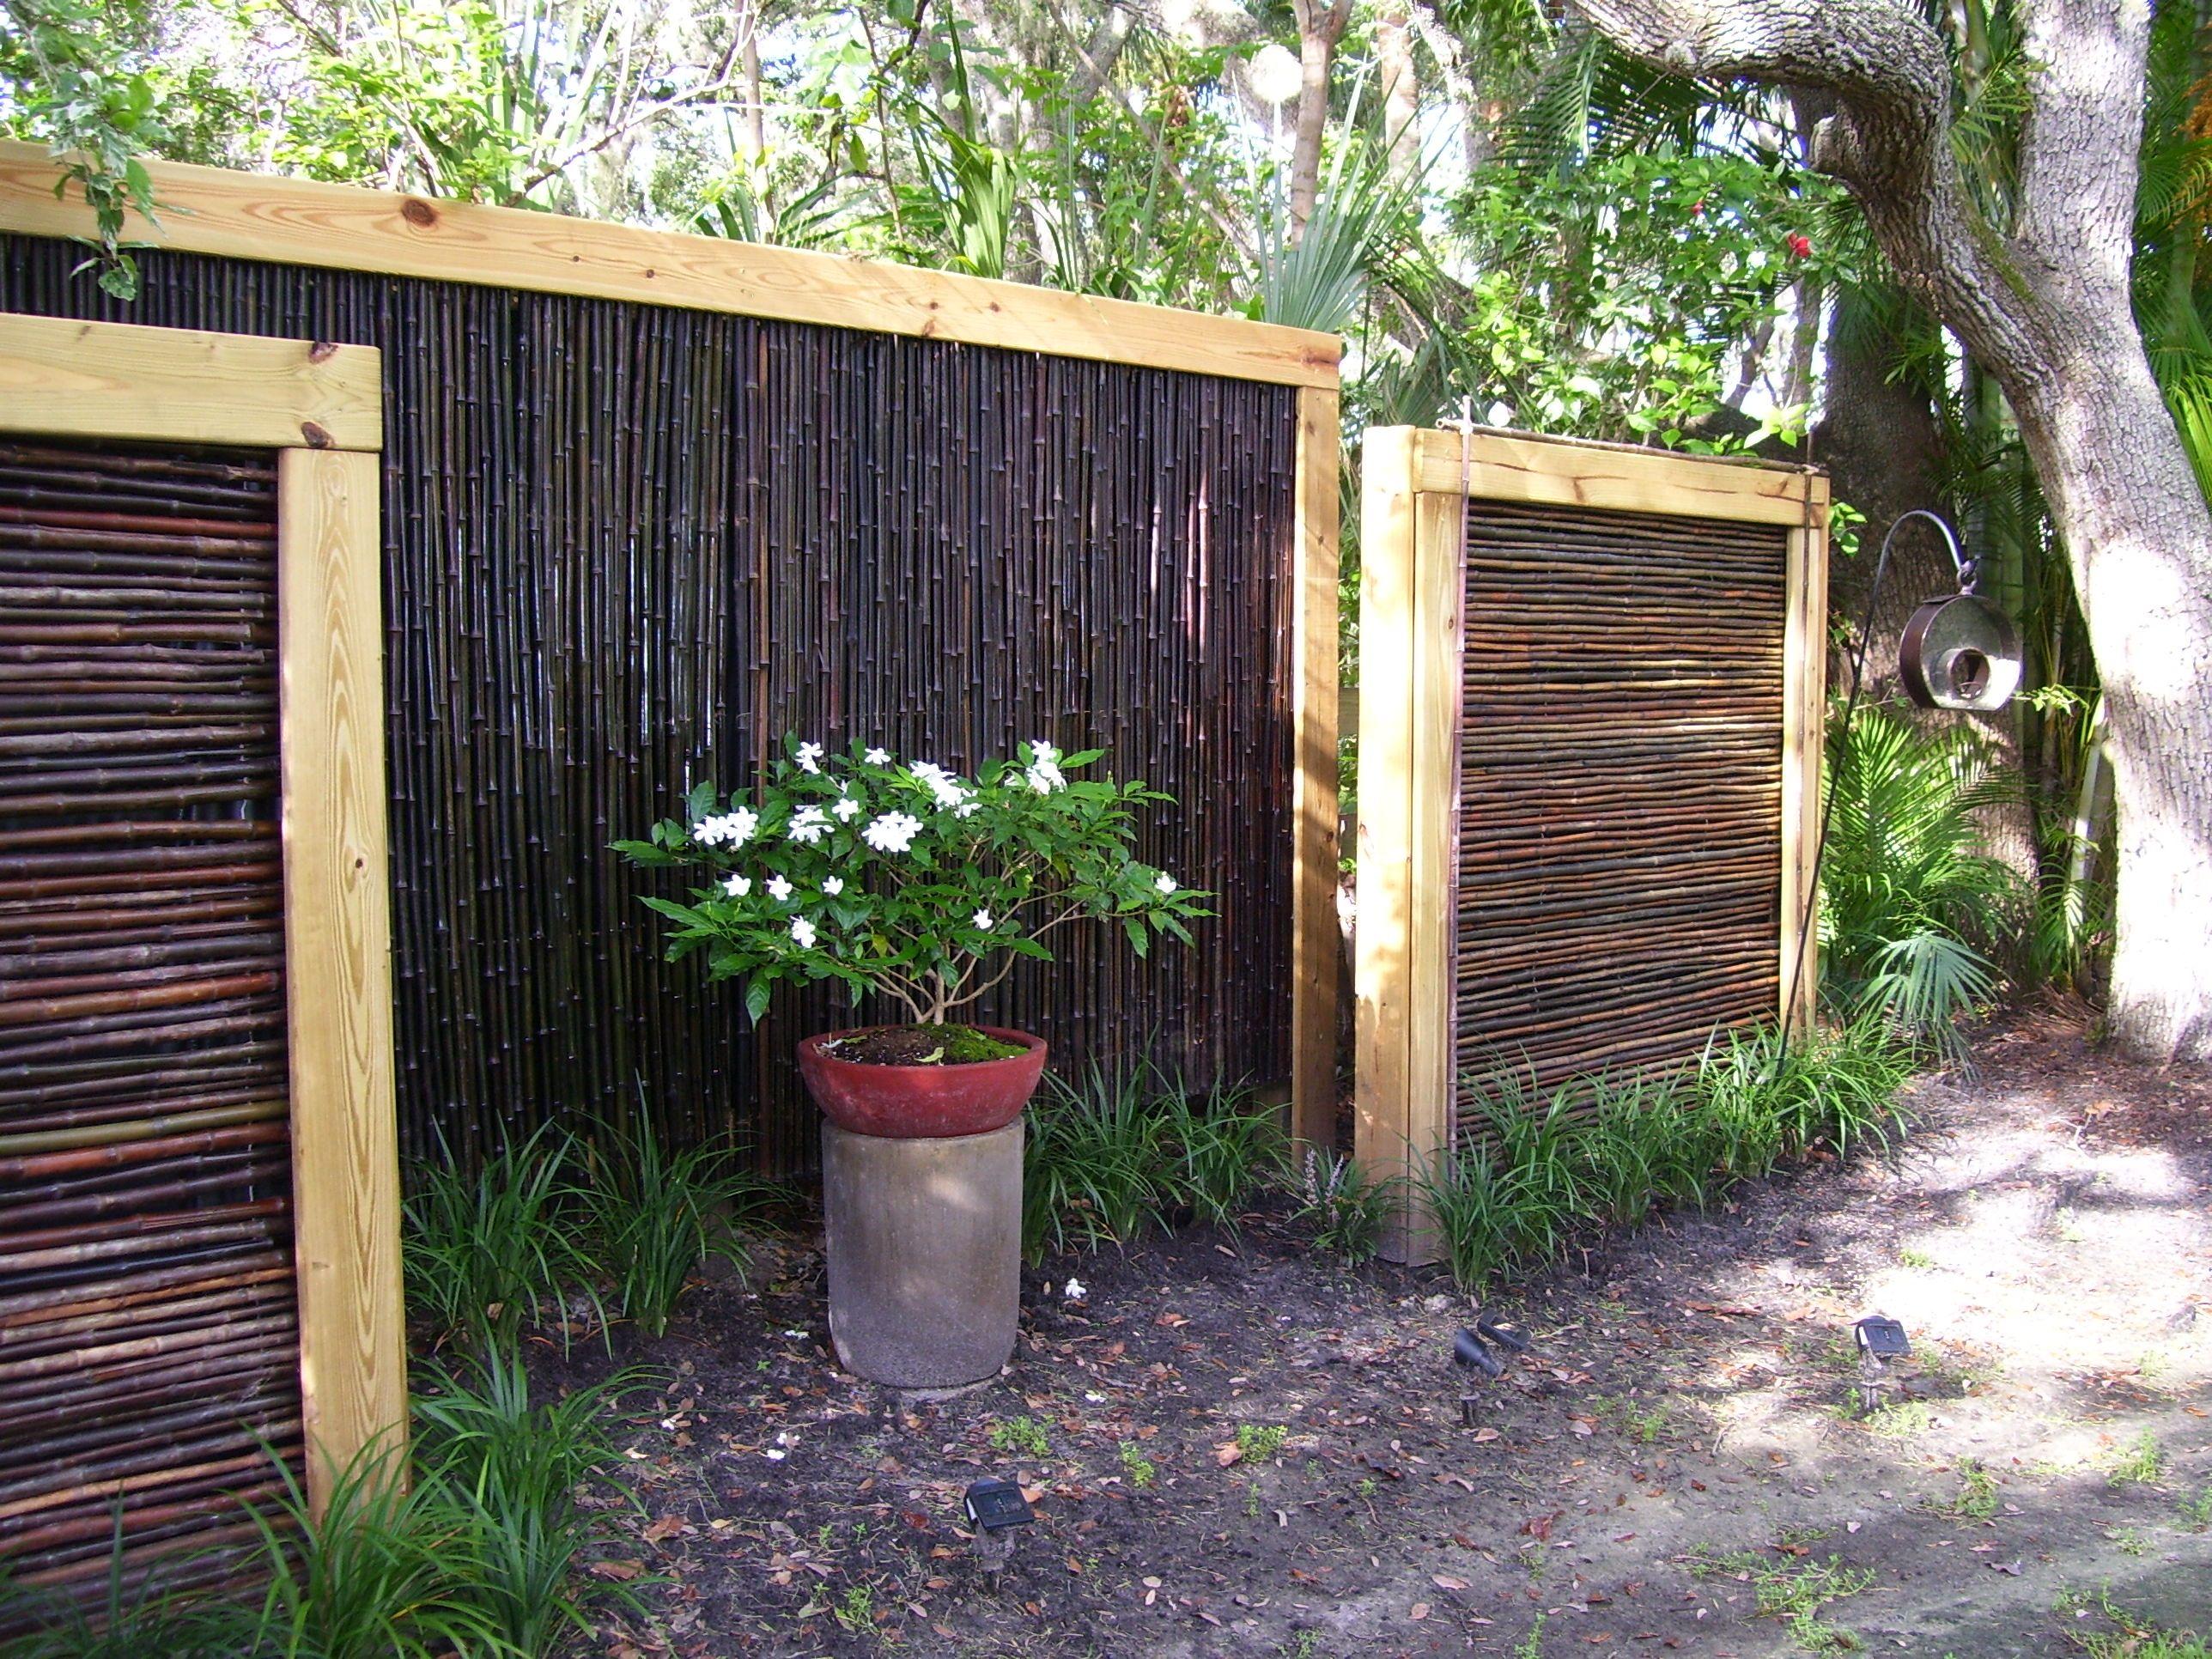 Privacy Screens My Garden Ideas and Likes Small garden